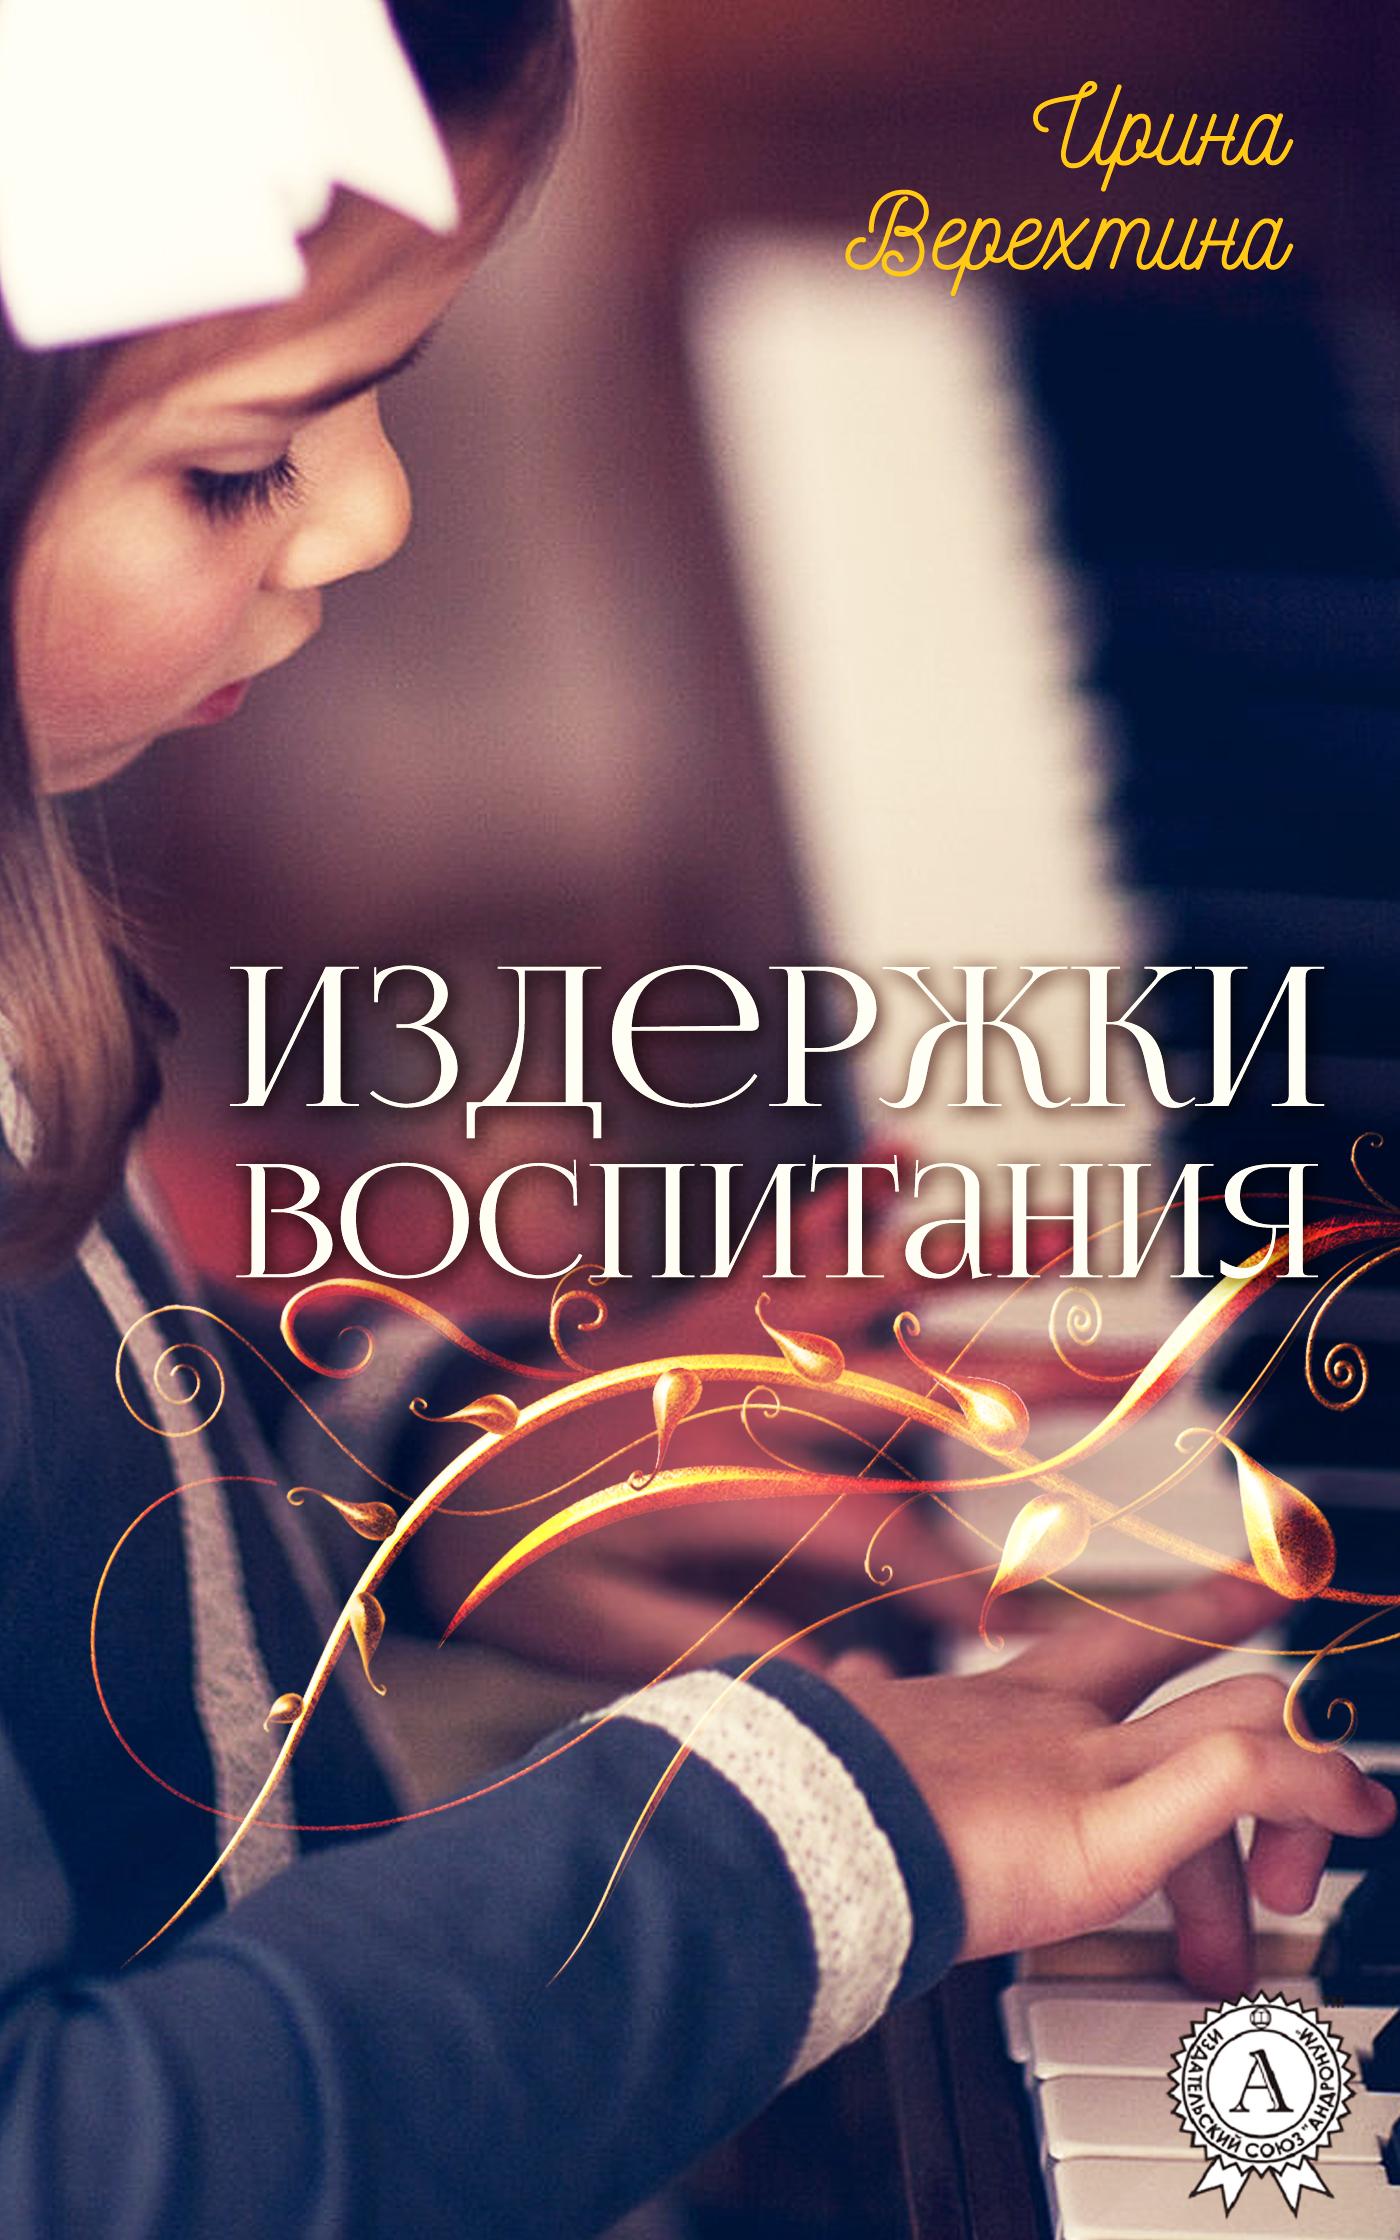 обложка книги static/bookimages/24/42/92/24429252.bin.dir/24429252.cover.jpg